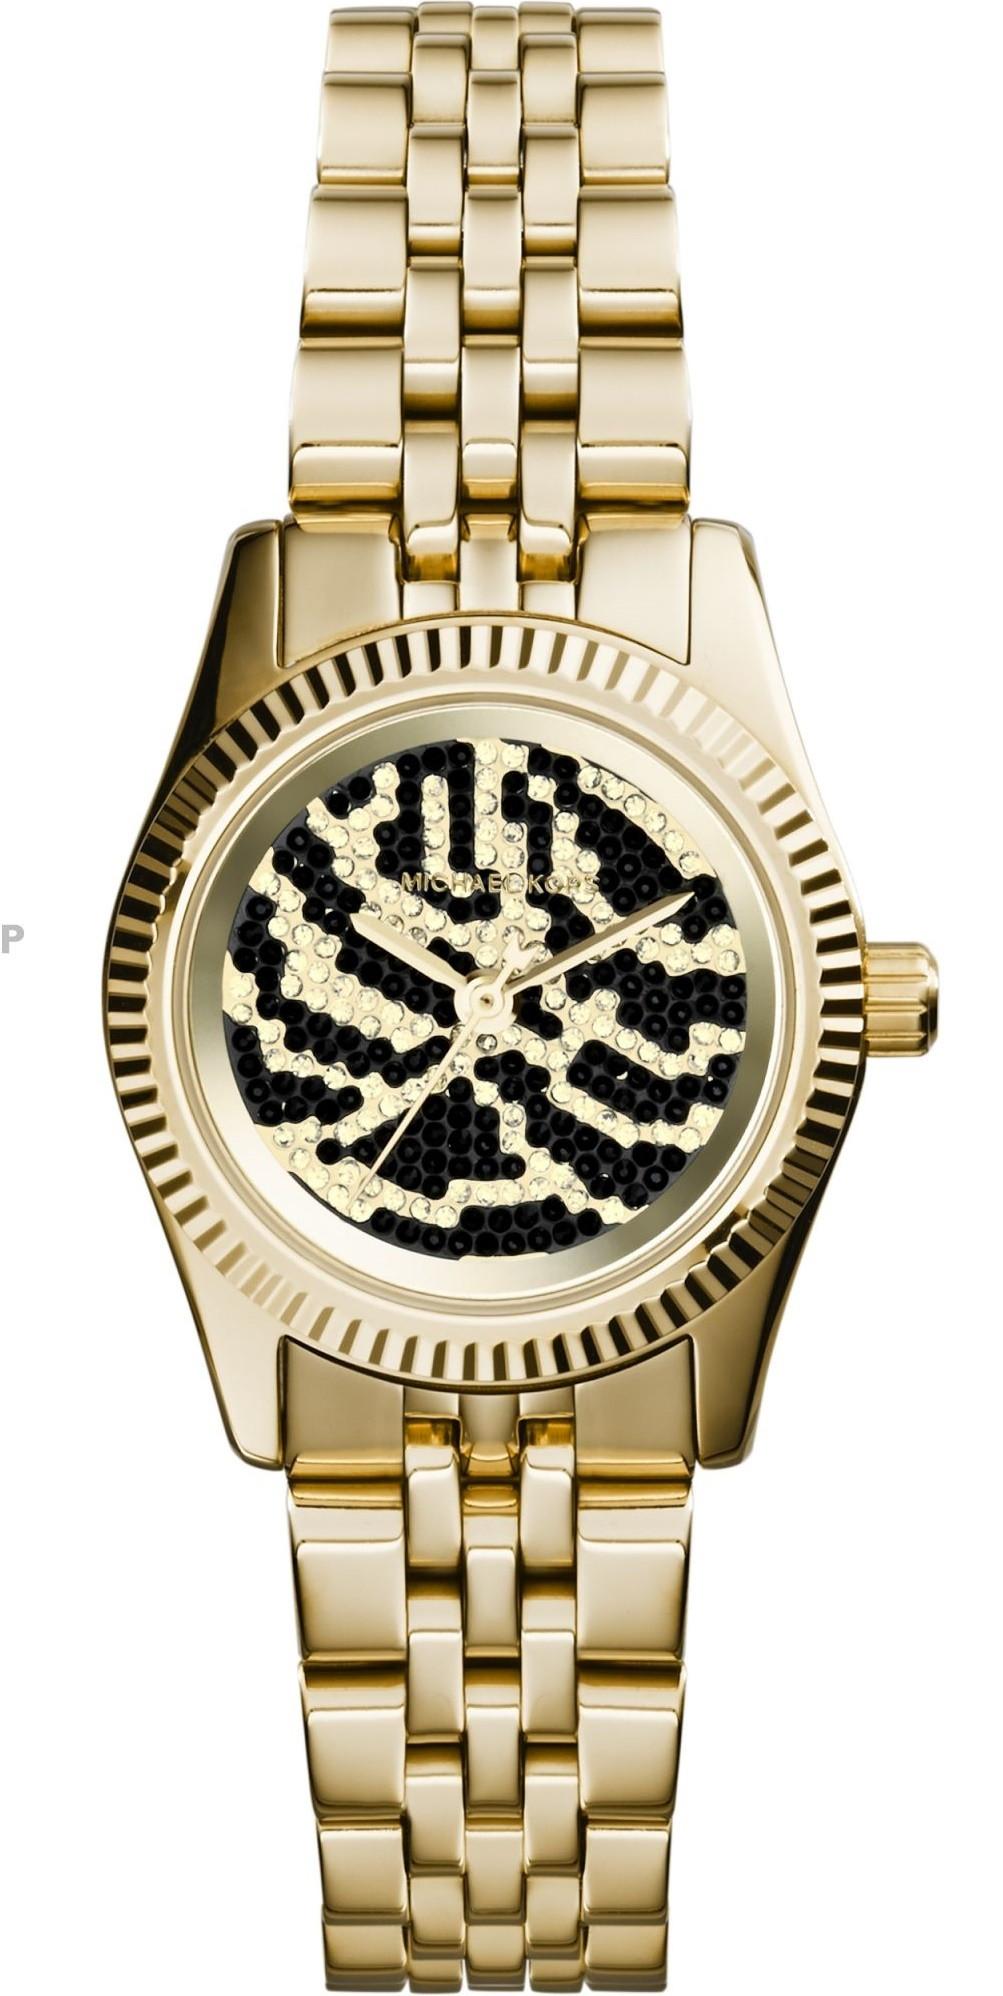 41af5a9bf346 Michael Kors Women's Petite Lexington Gold Tone Watch MK3300